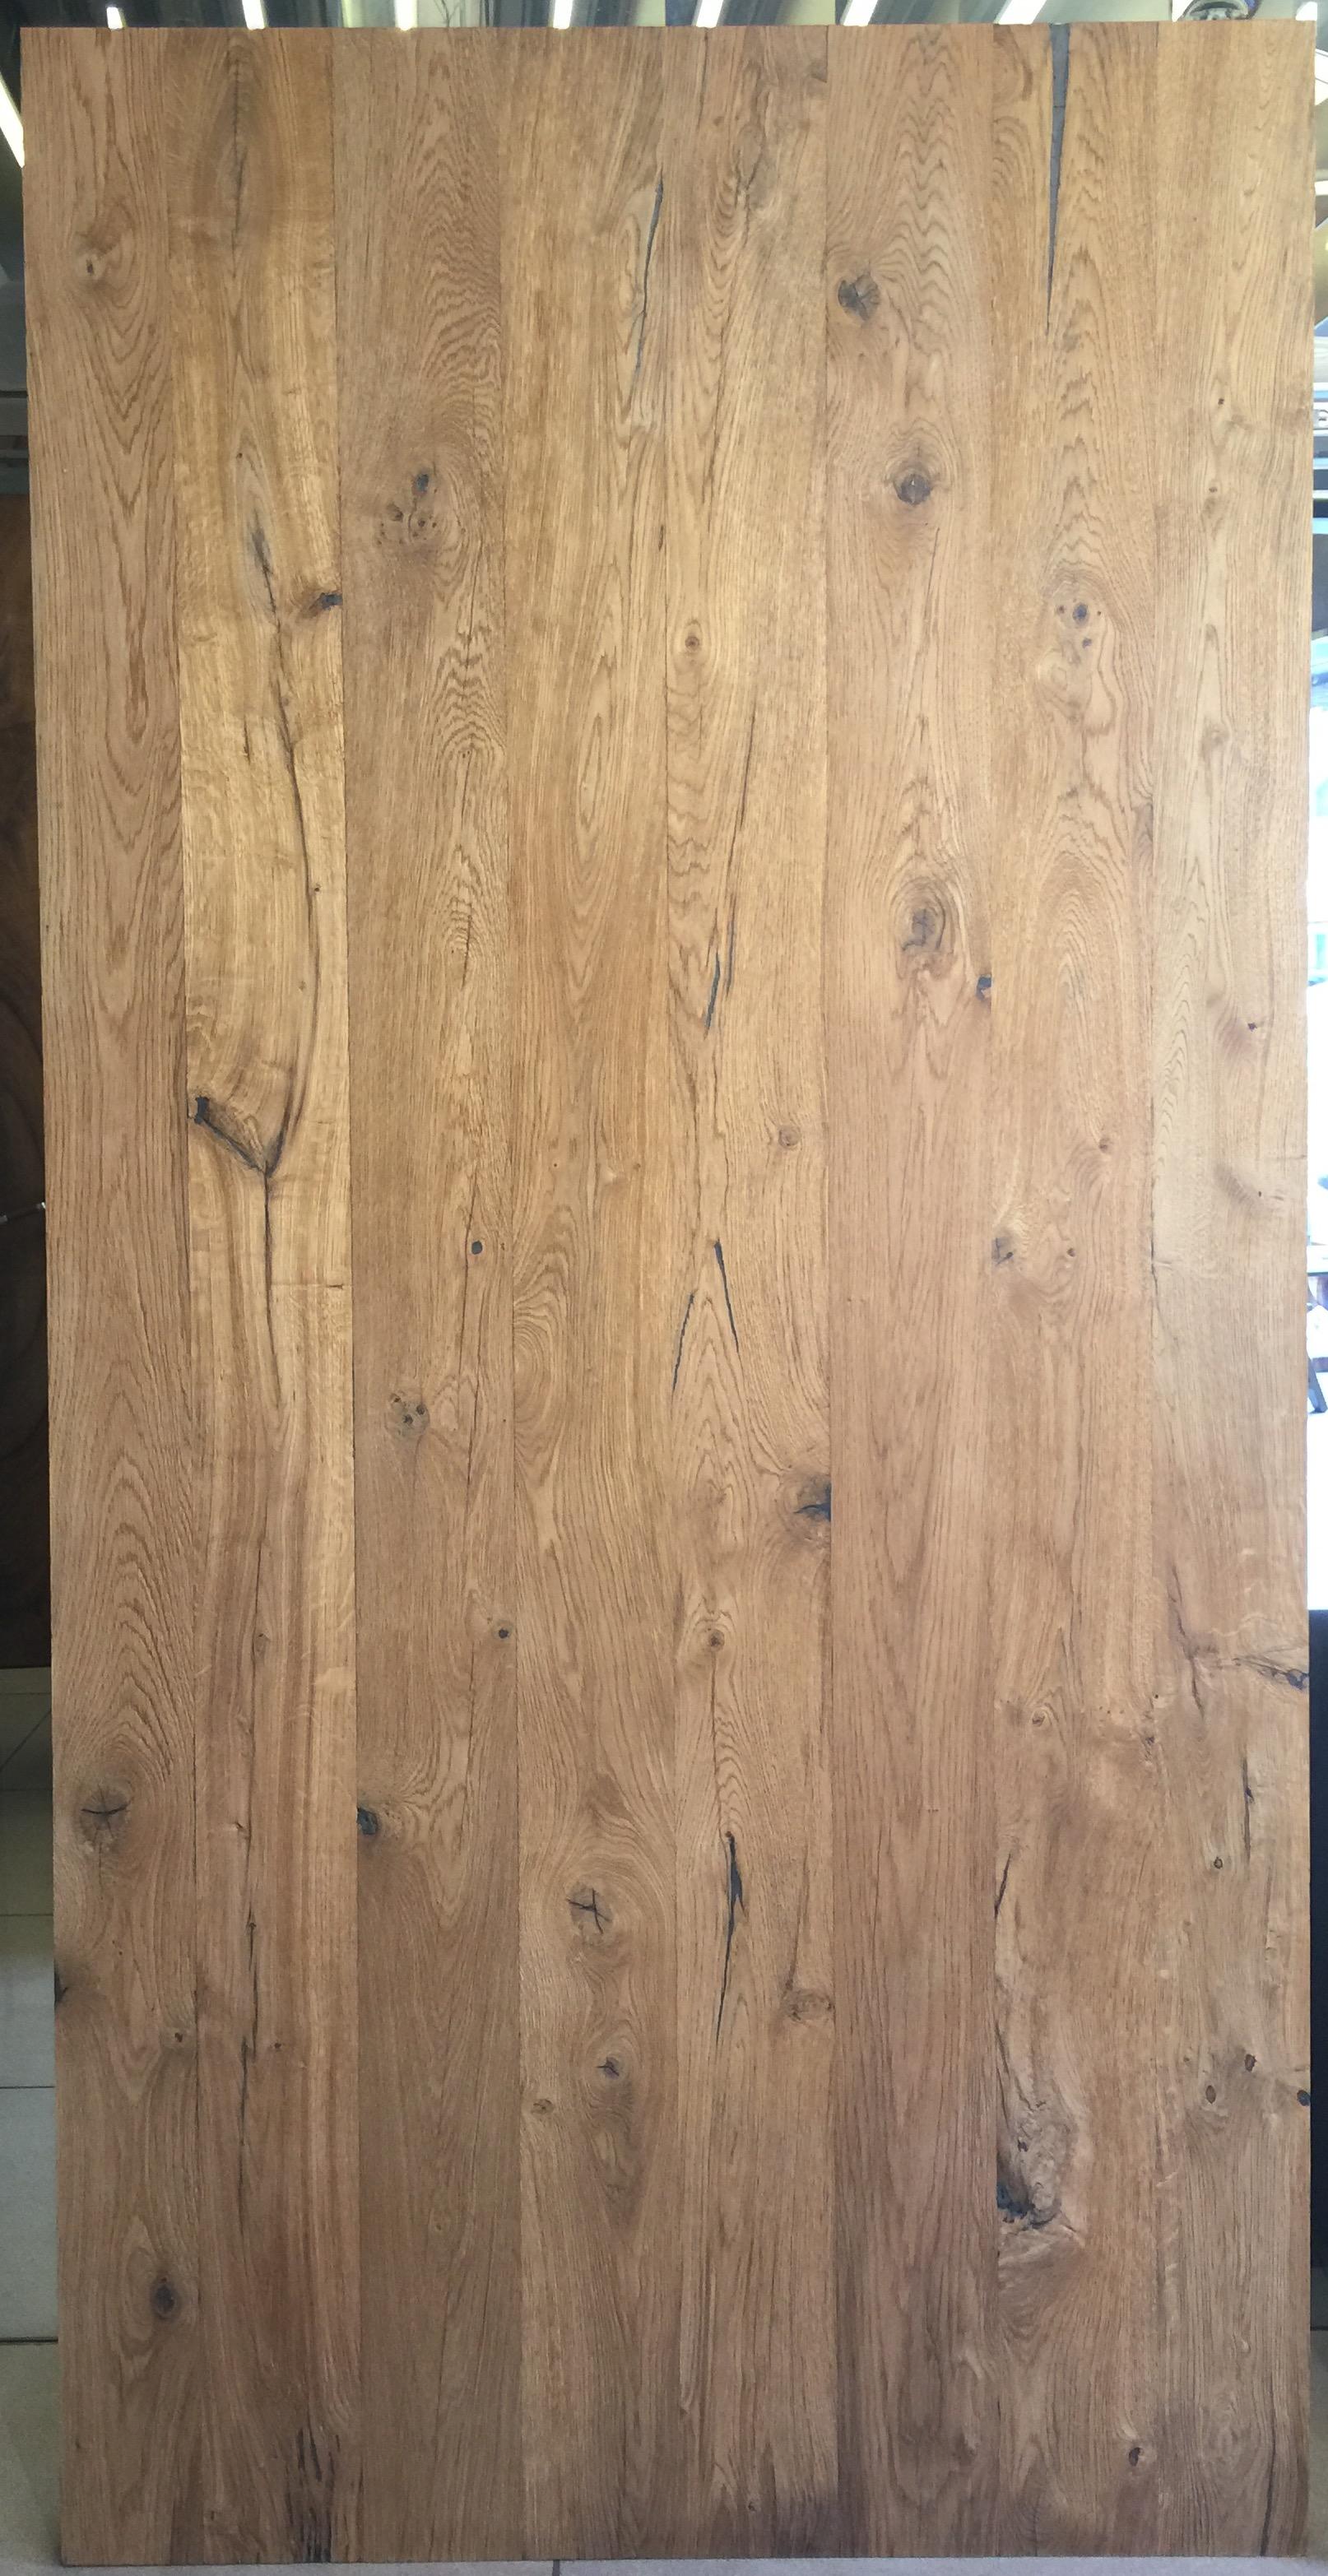 Thick Open Grain Emory Oak